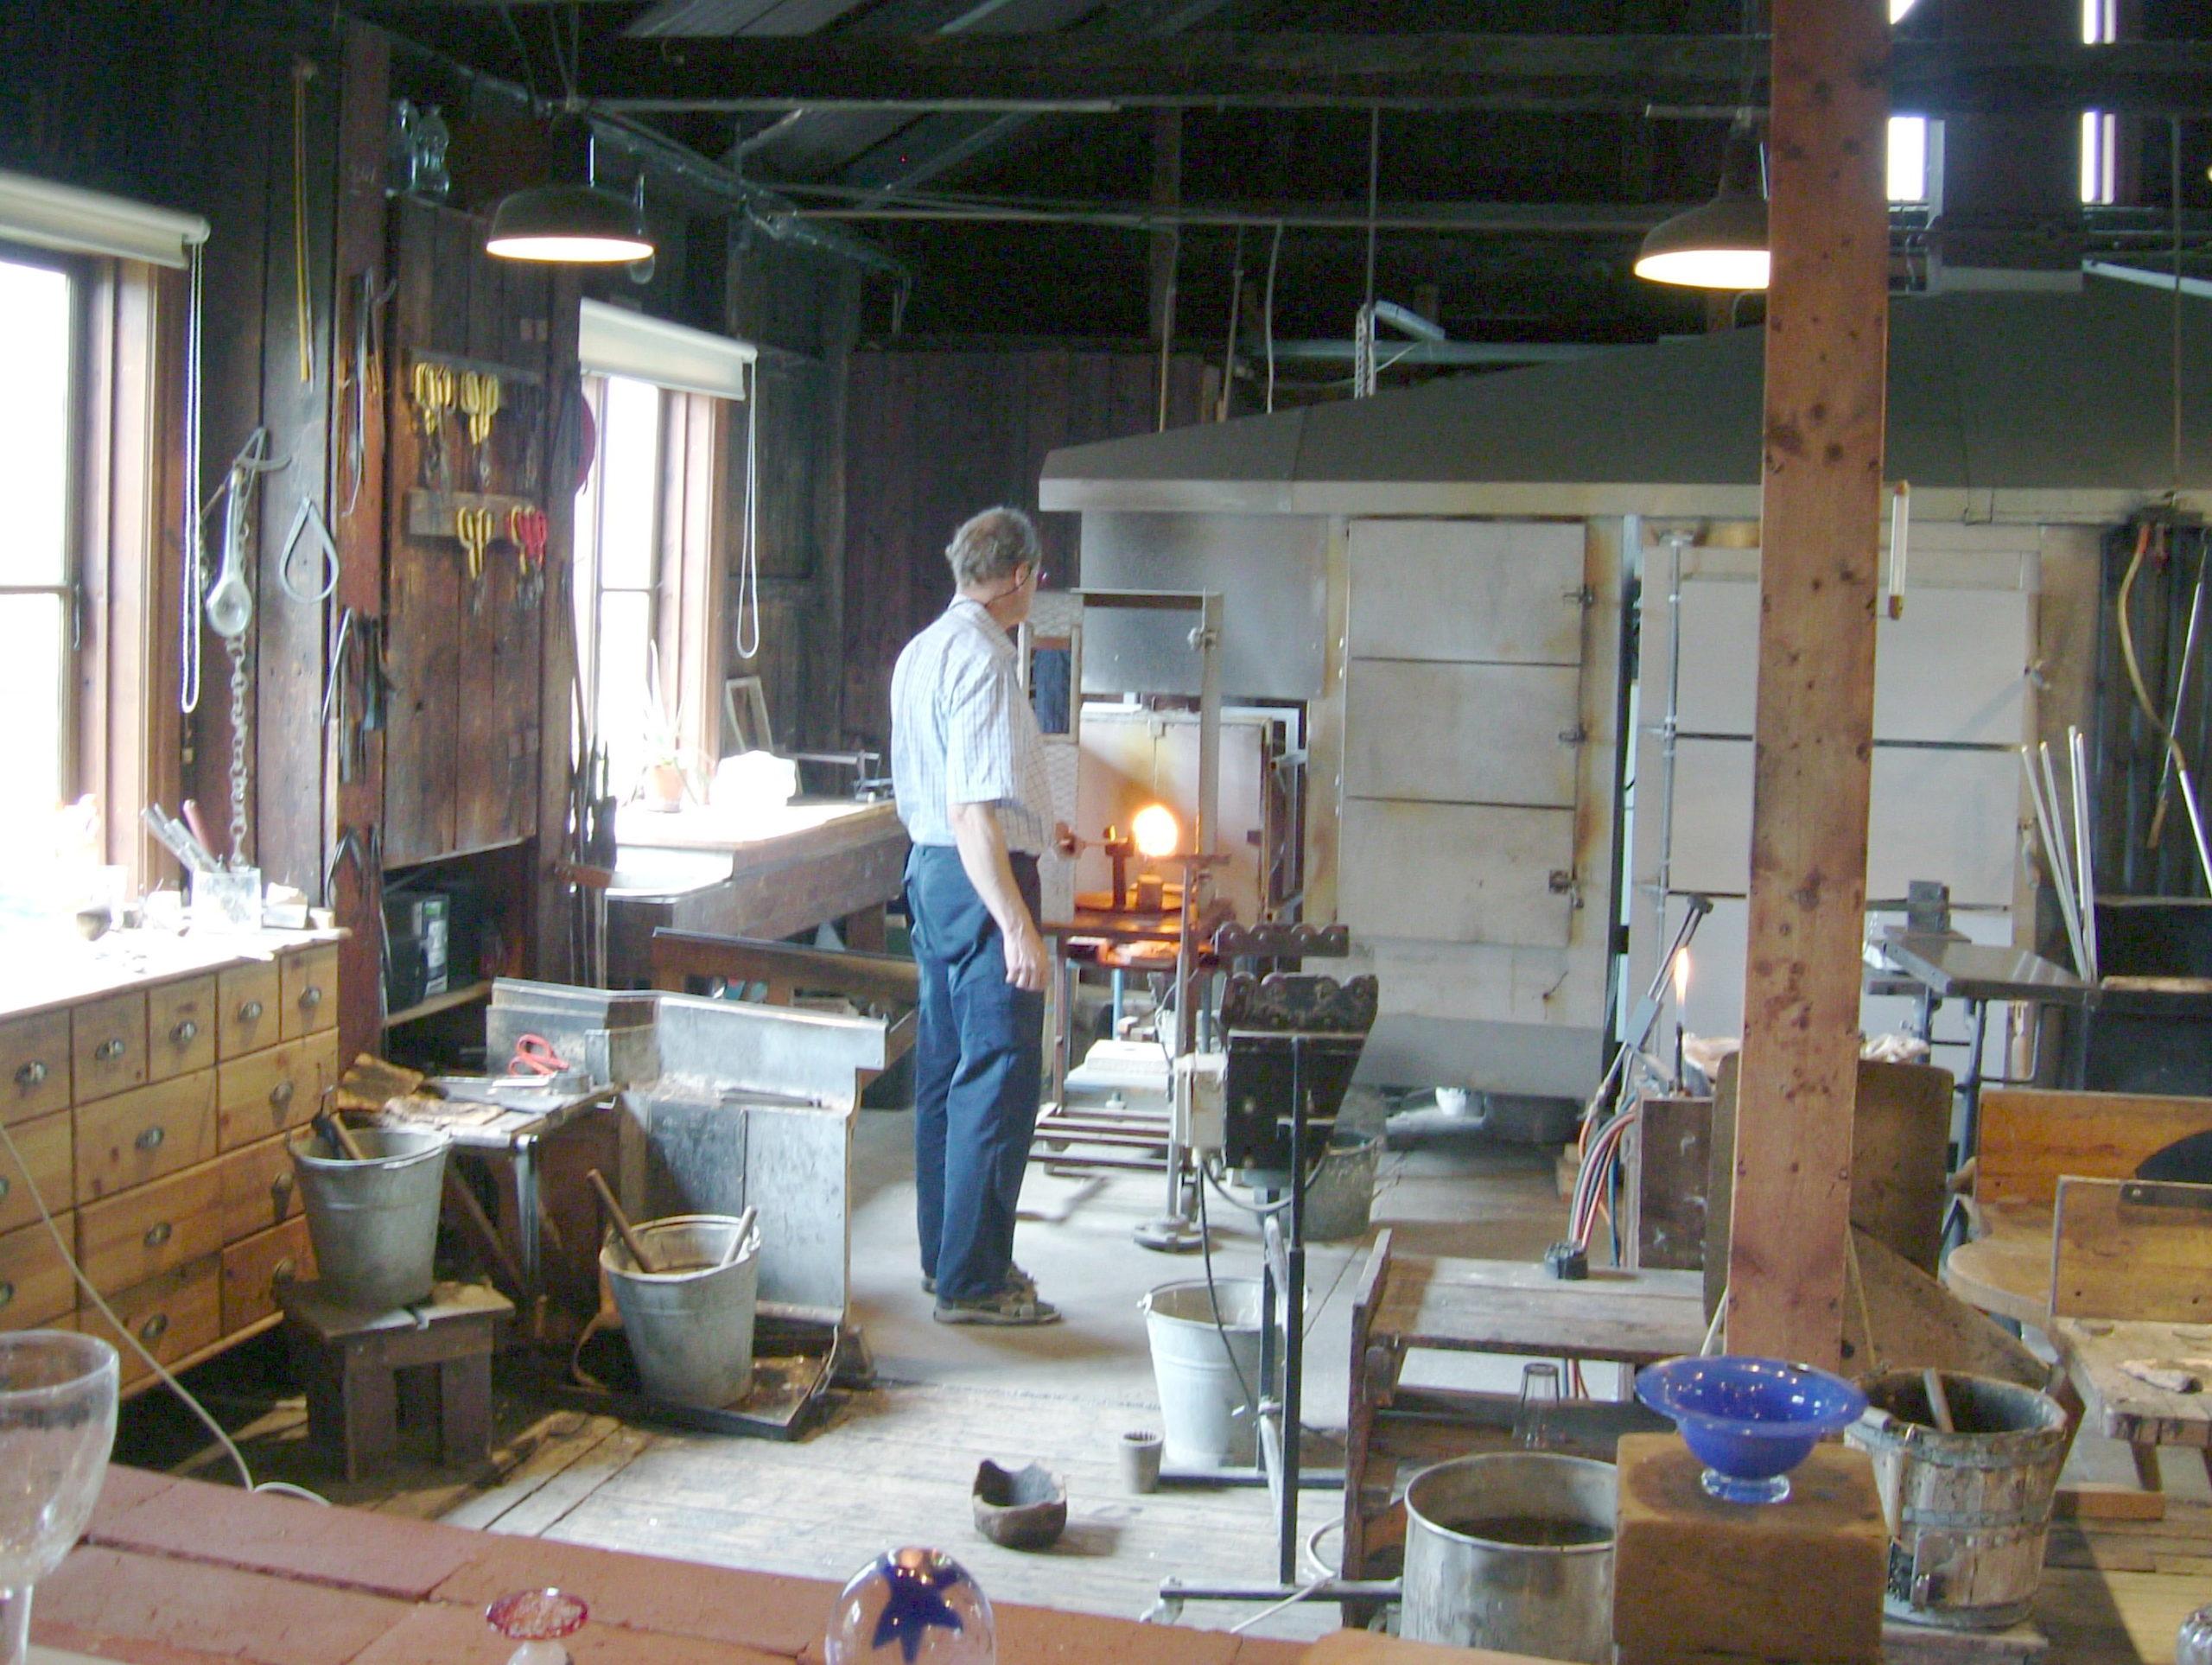 Glassmaker heats the glass in Skansen